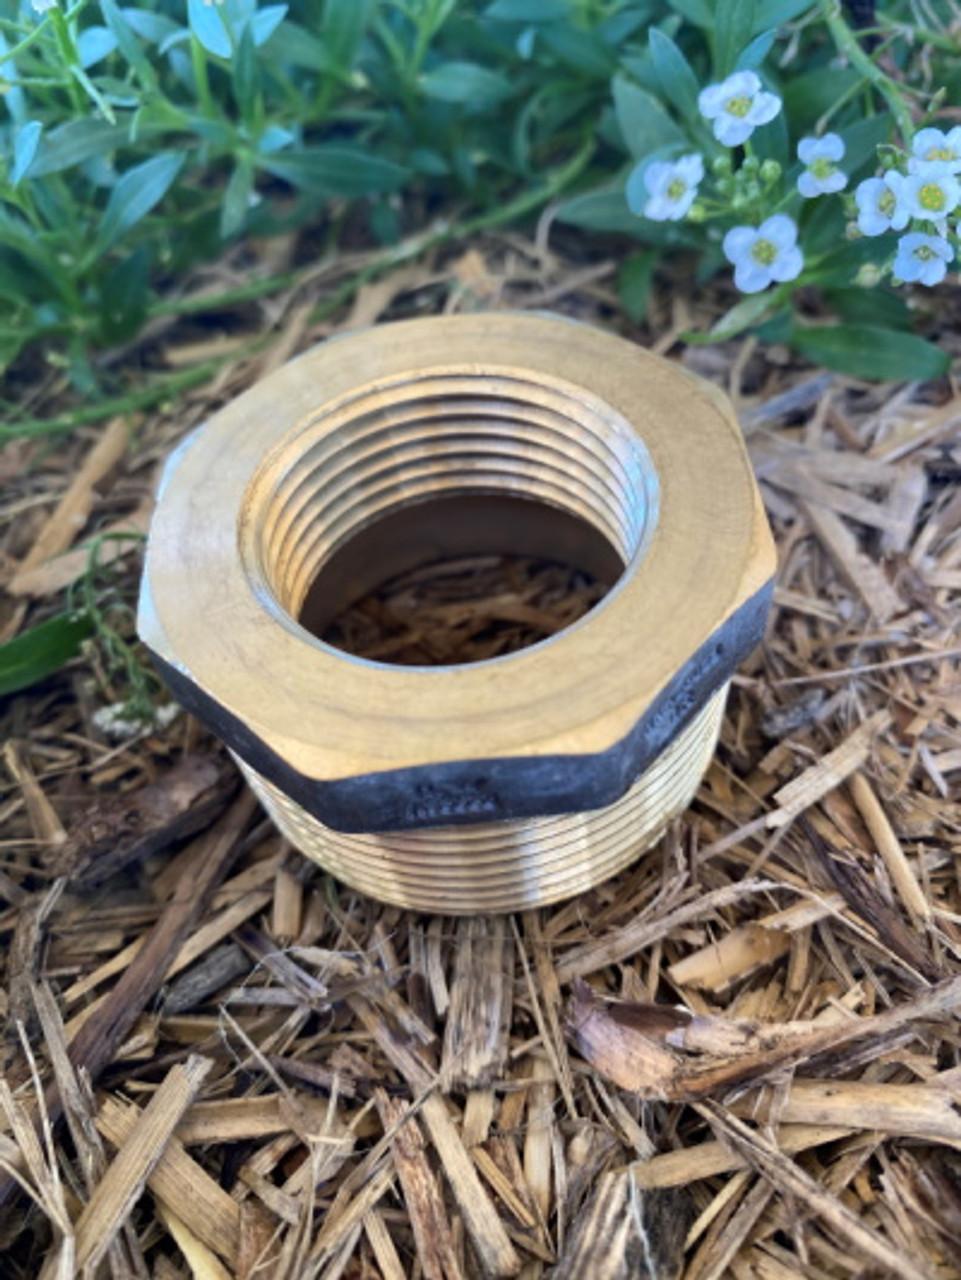 "Bush, 1/4"" x 1/8"" brass (8mm x 6mm) Watermark Approved"